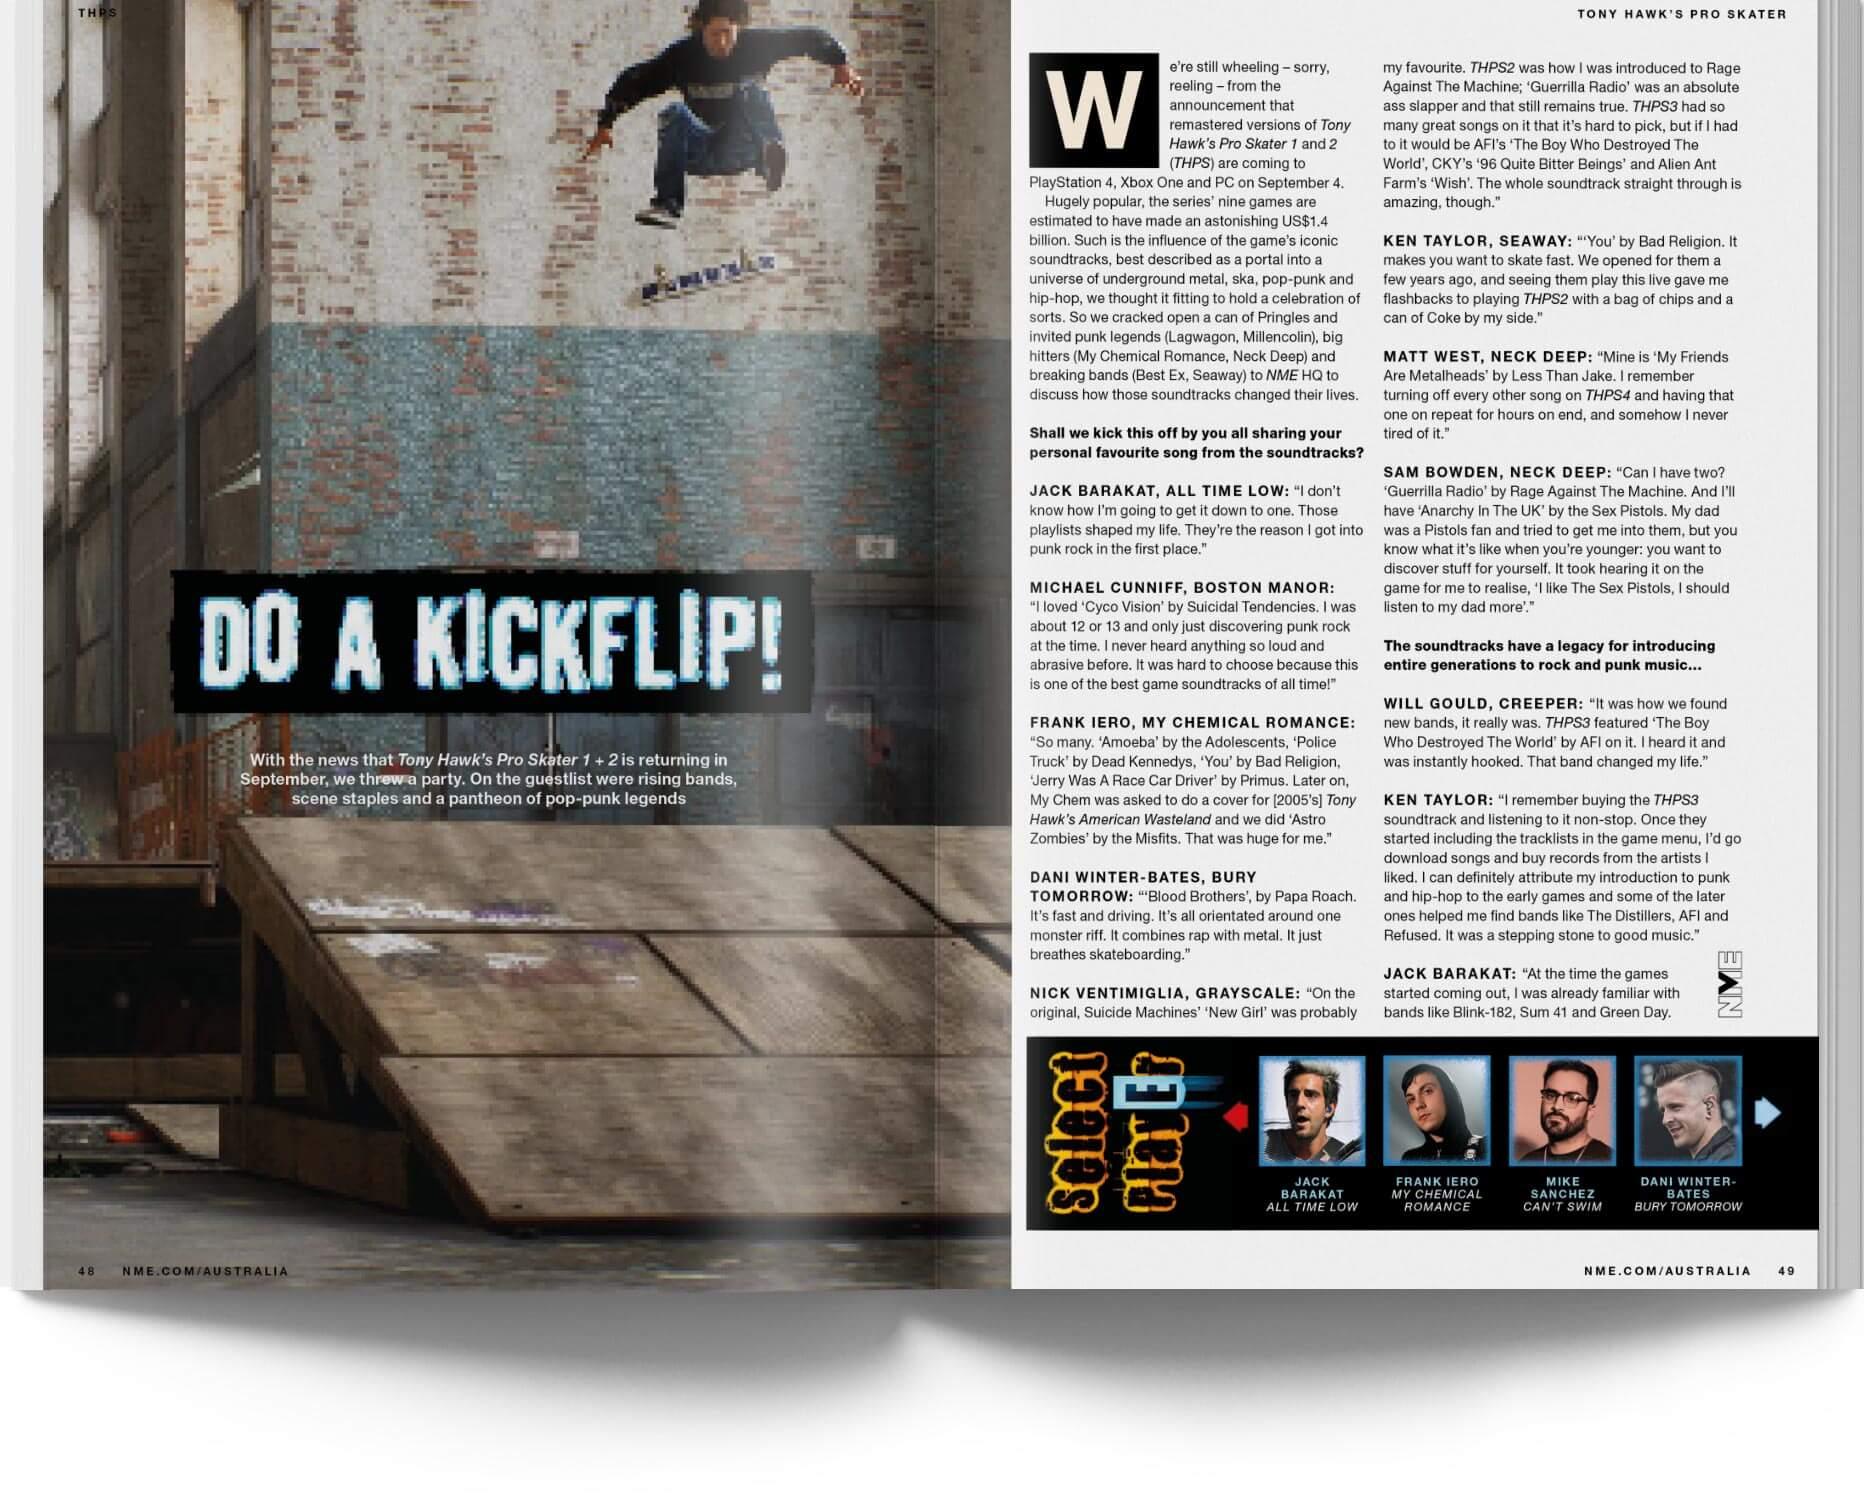 NME Australia 07 - THPS 1 +2